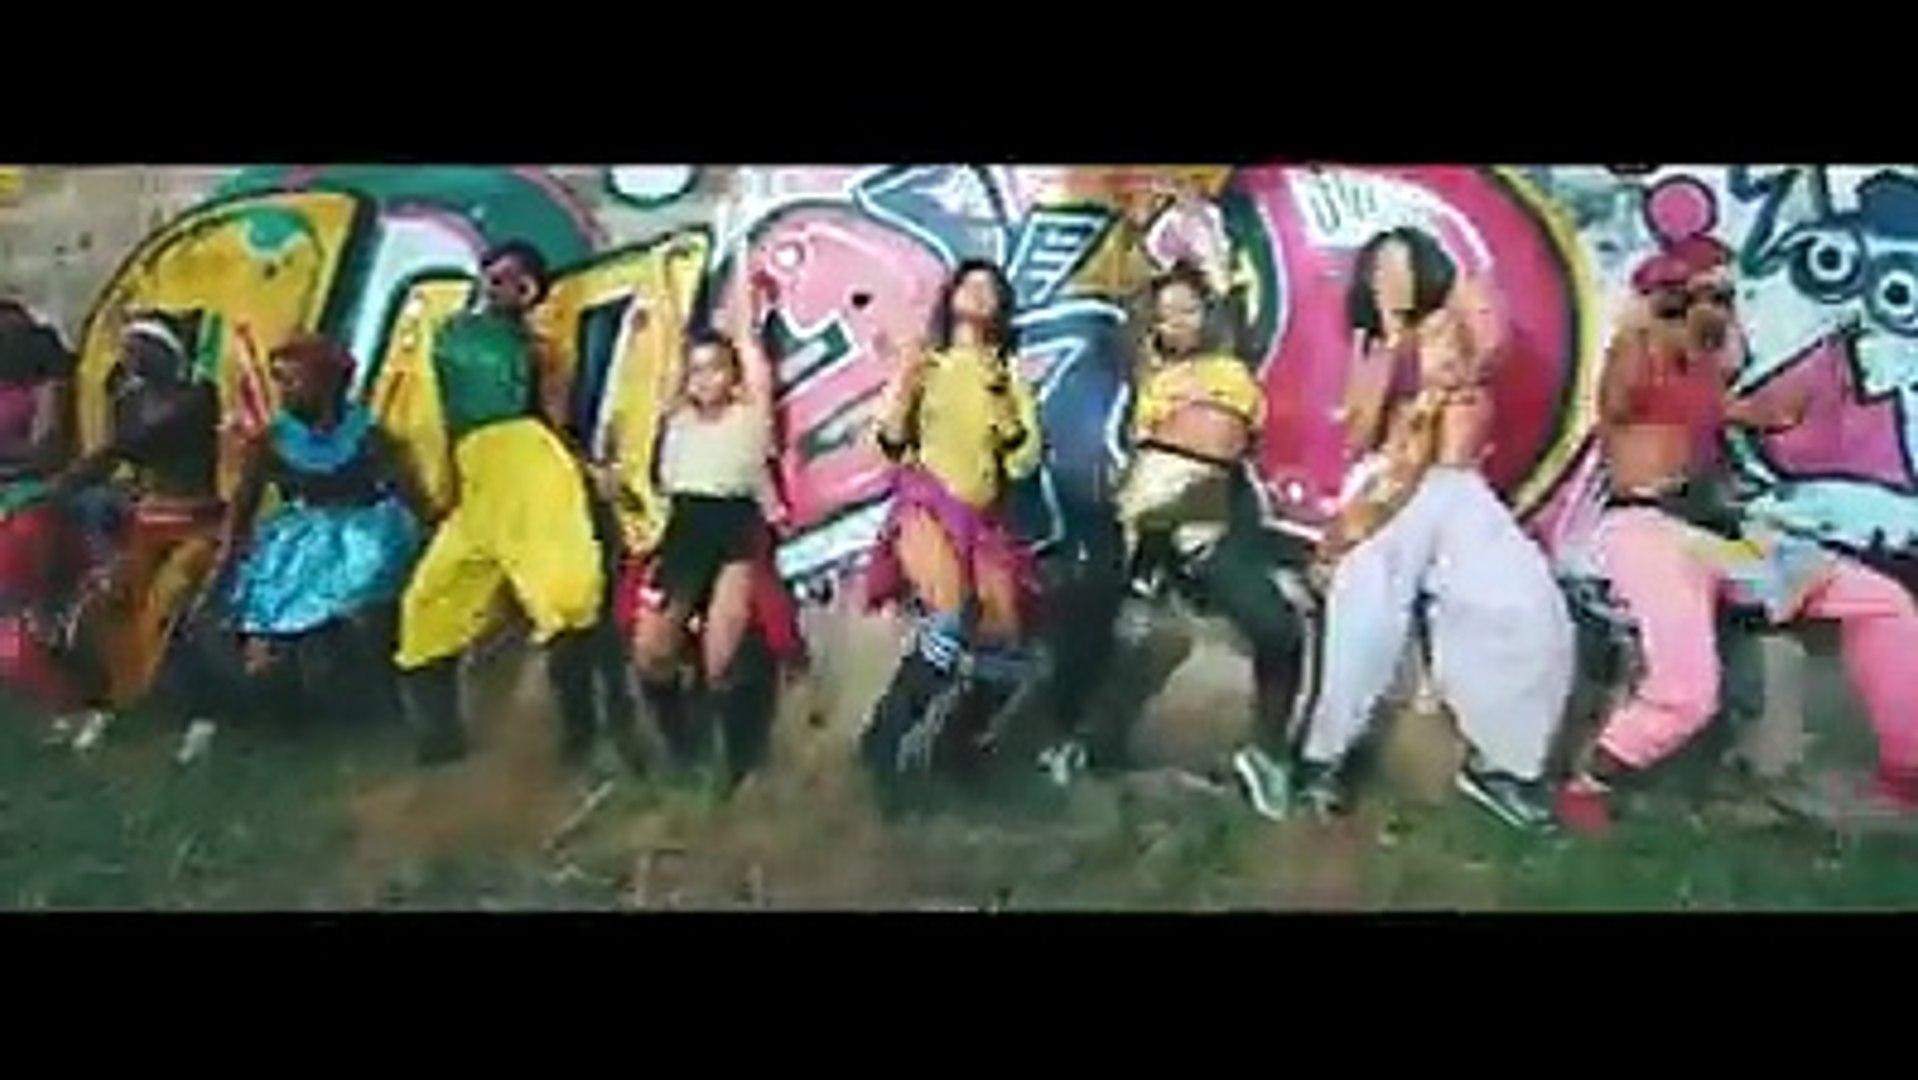 NP #AGASUSURUKO - STARBOY - SOCO ft. TERRI X SPOTLESS X CEEZA MILLI X WIZKID